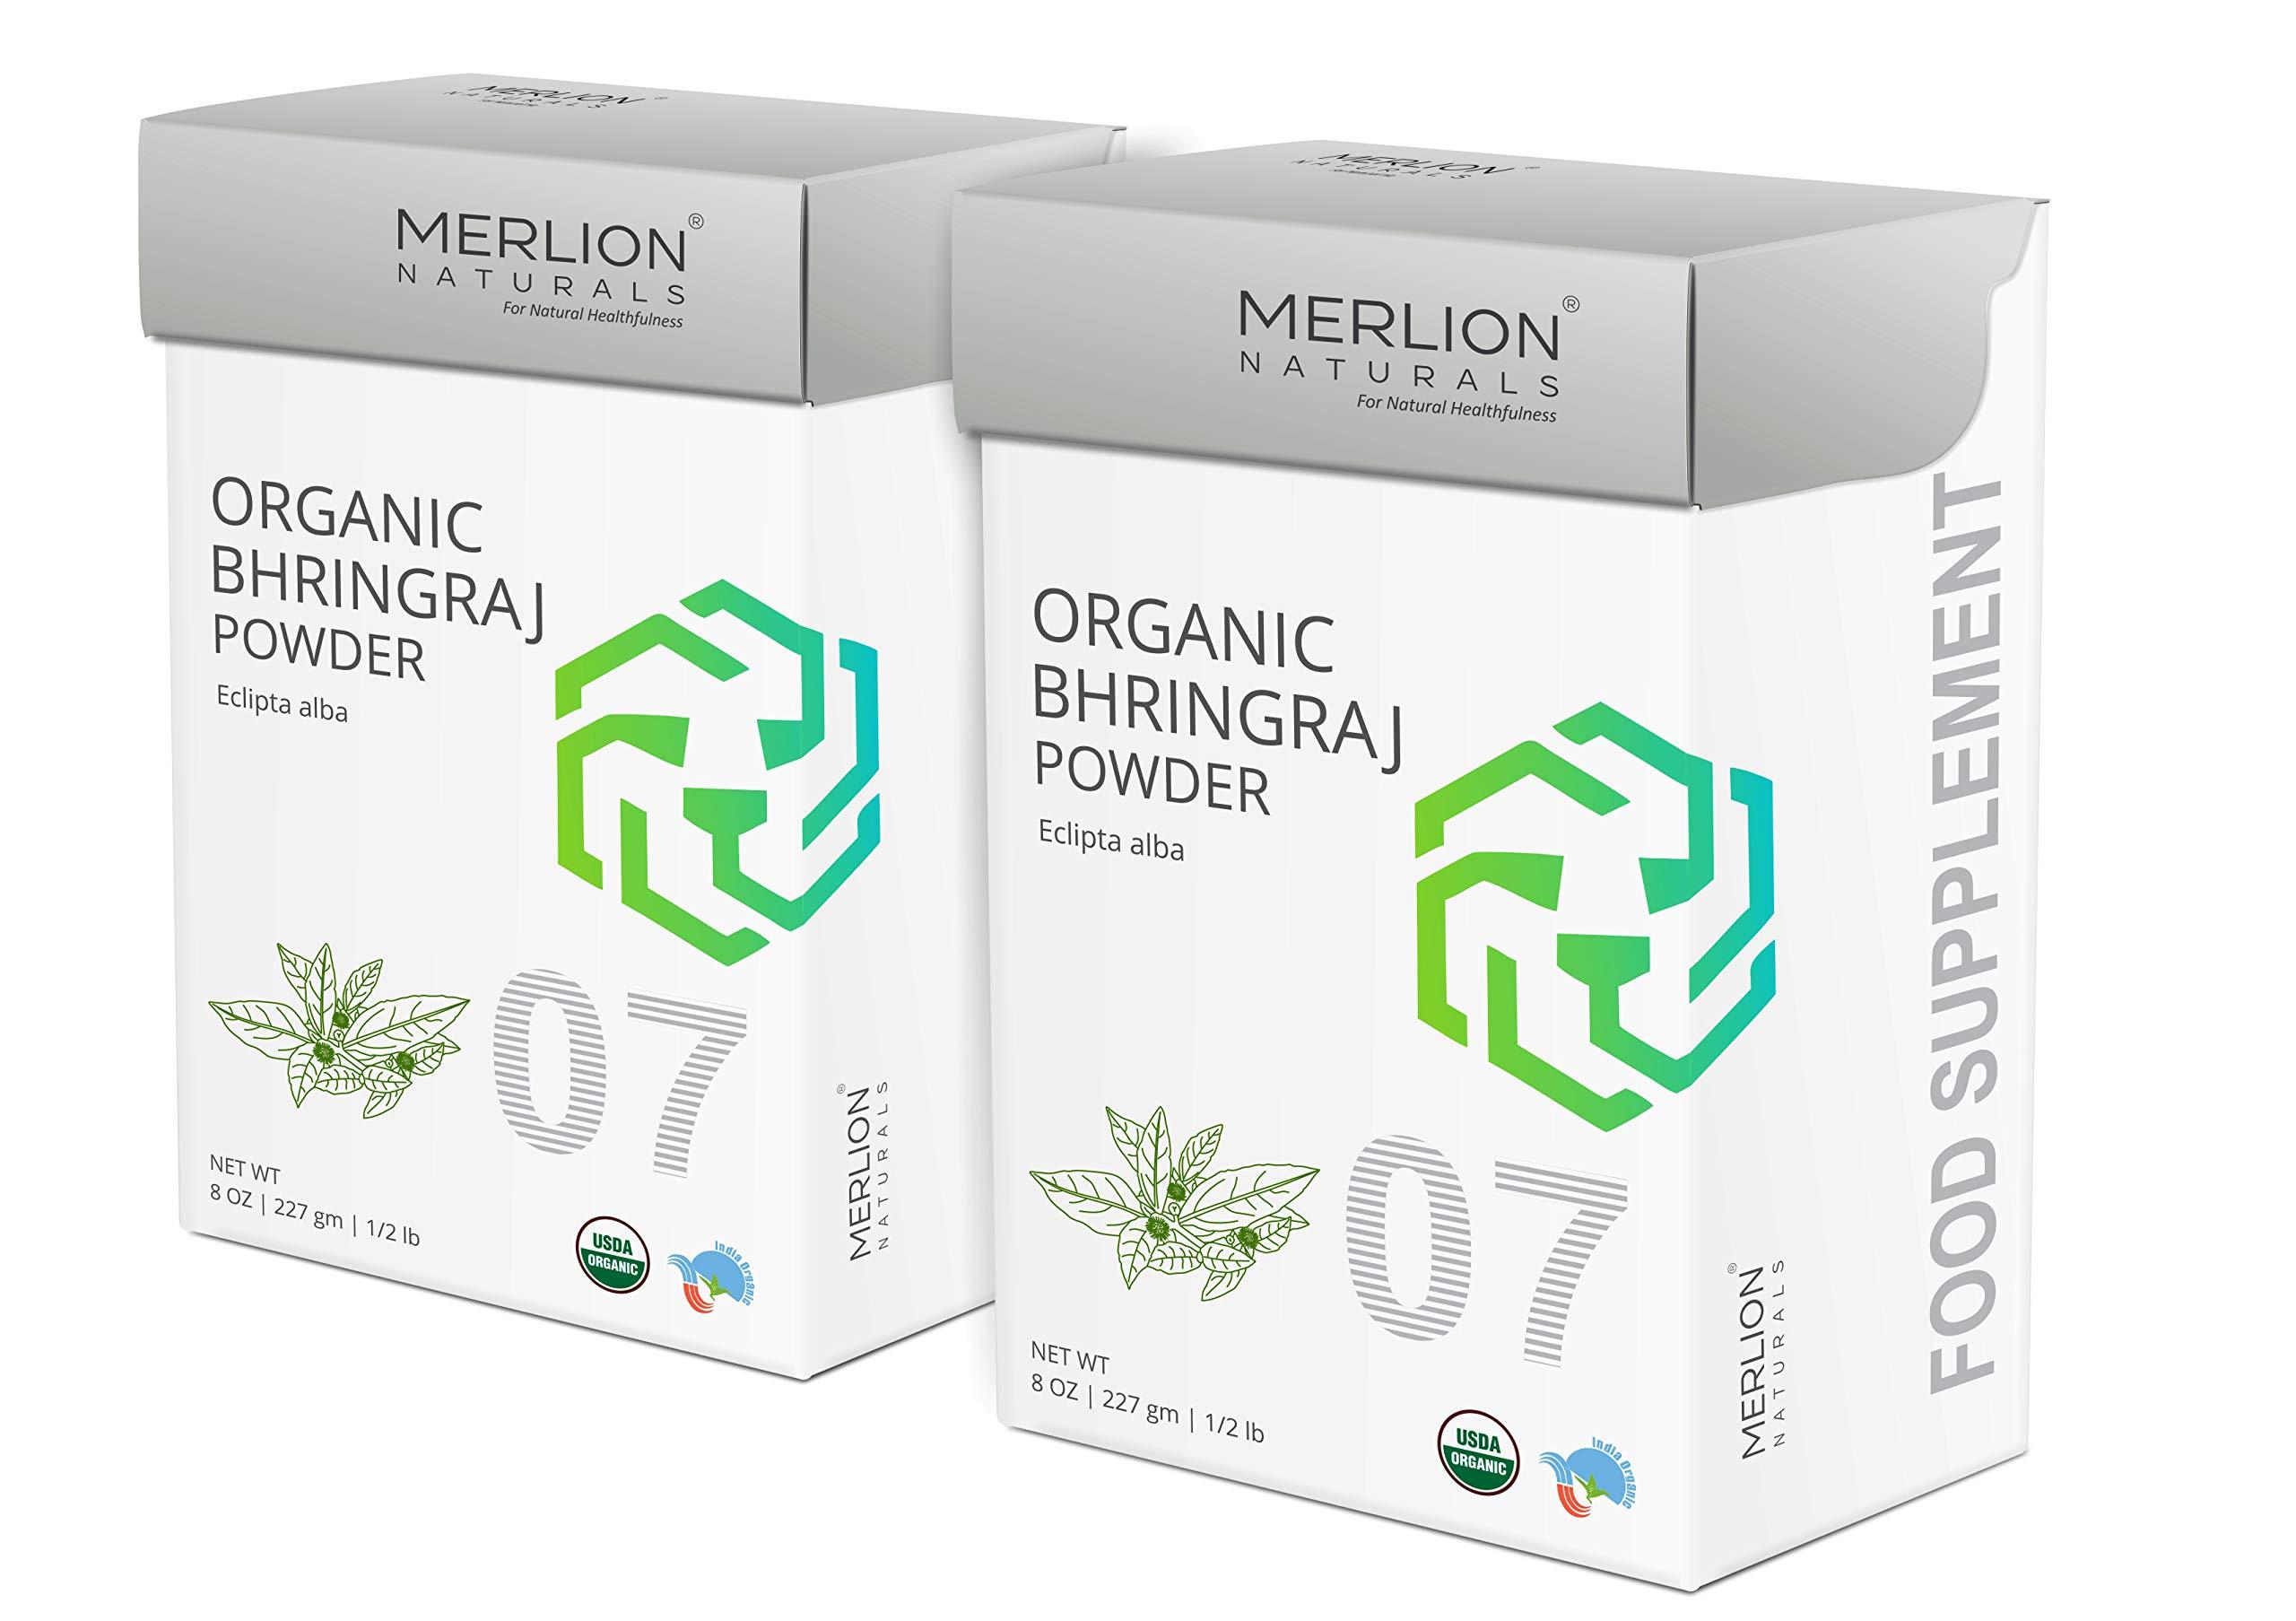 Organic Bhringraj Powder by Merlion Naturals | Eclipta alba/False Daisy (16 OZ (2 Pack of 8 OZ))